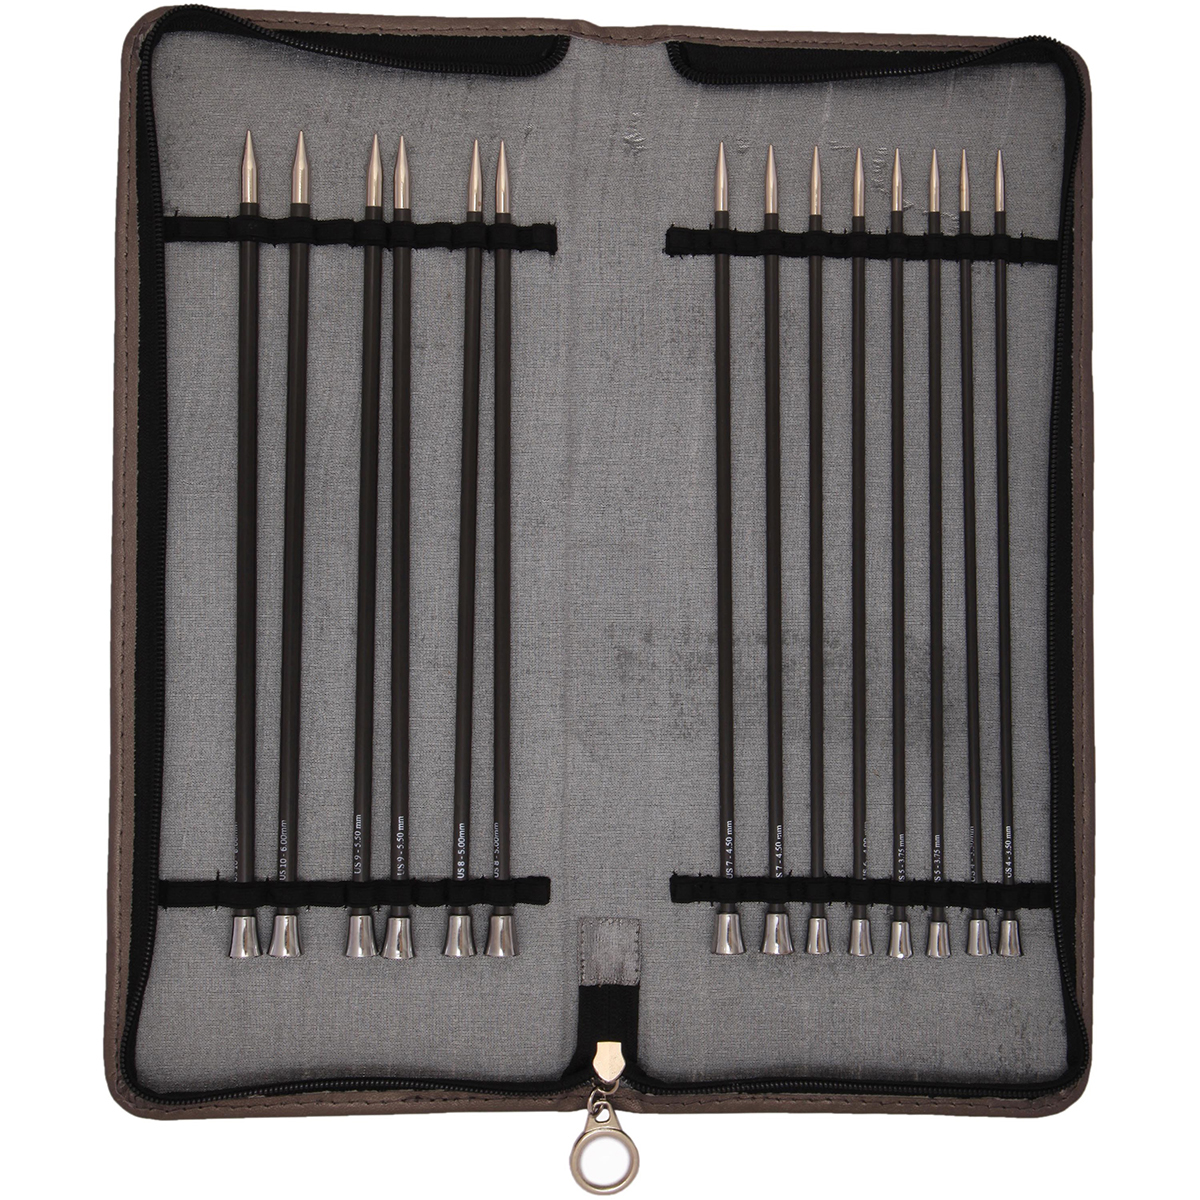 "Knitter's Pride-Karbonz Straight Needle Set 10""-"